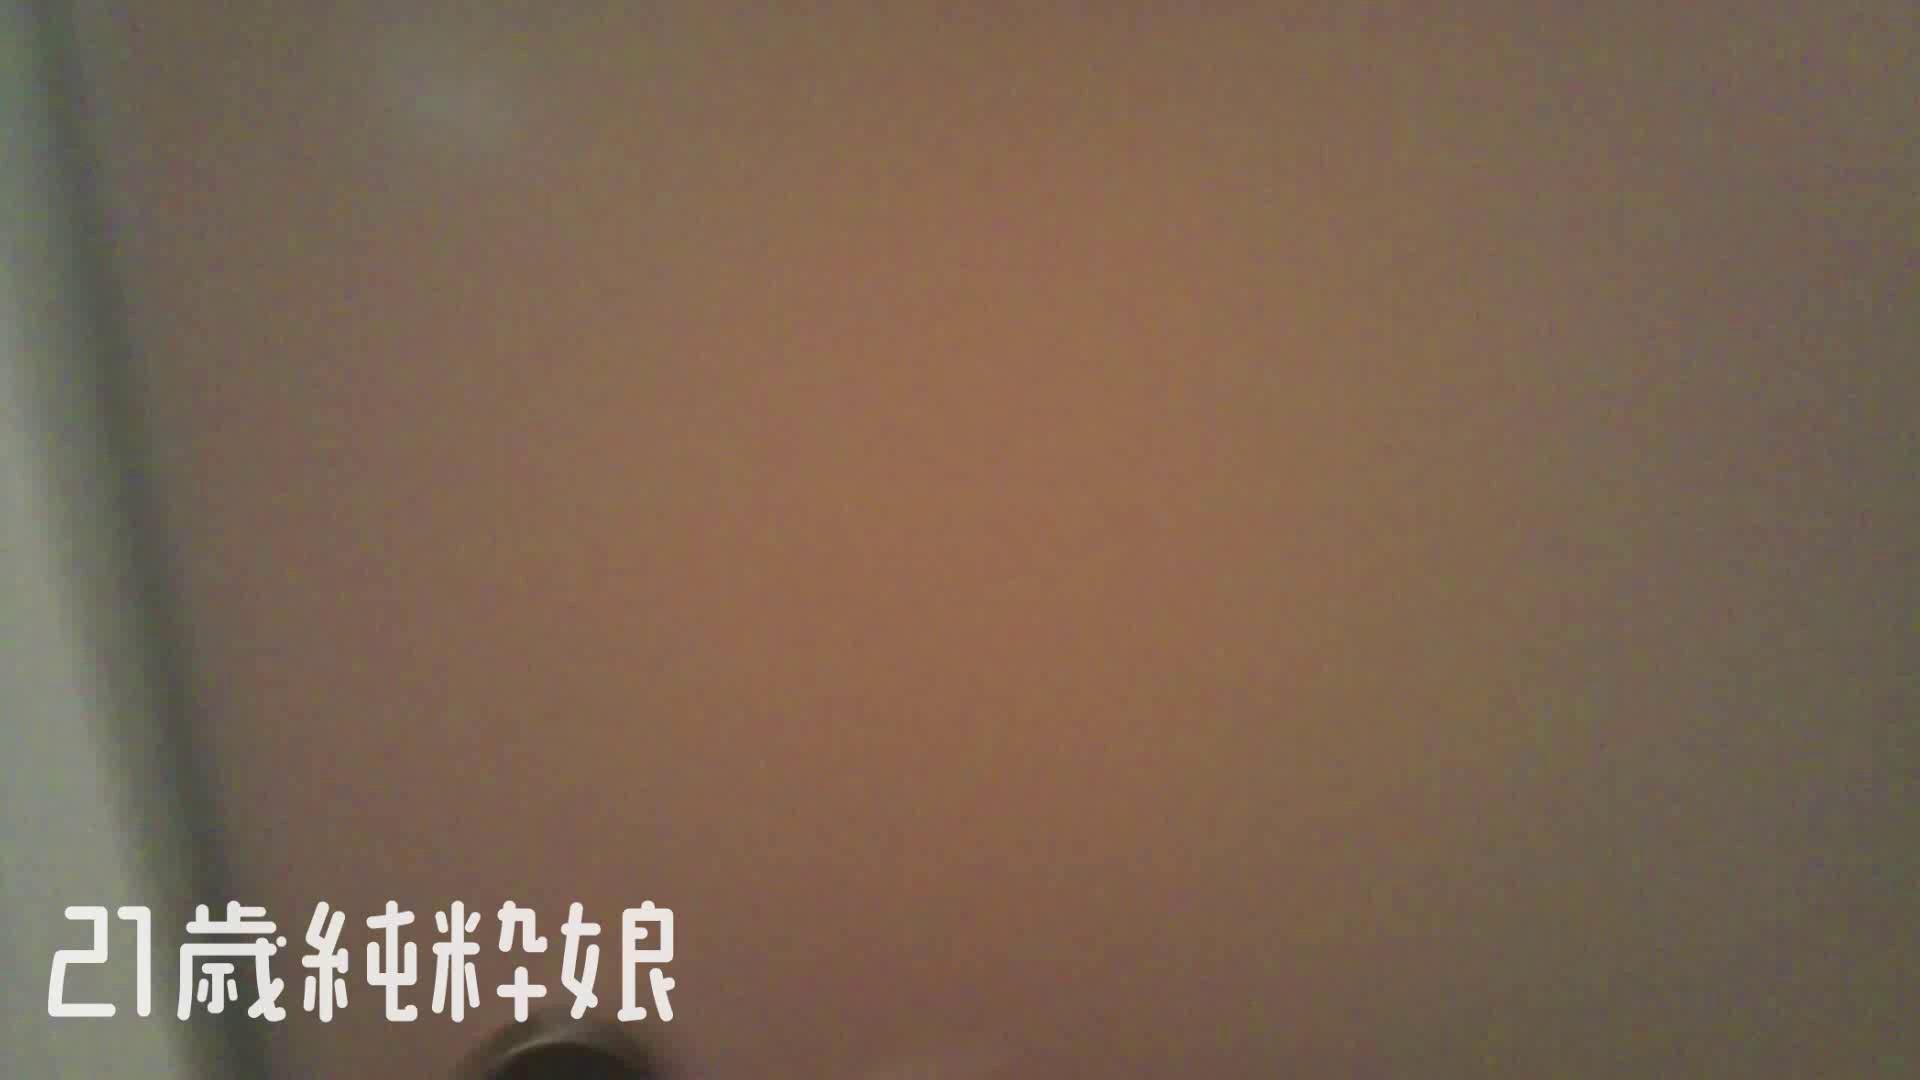 Gカップ21歳純粋嬢第2弾Vol.5 OLヌード天国  110PIX 18